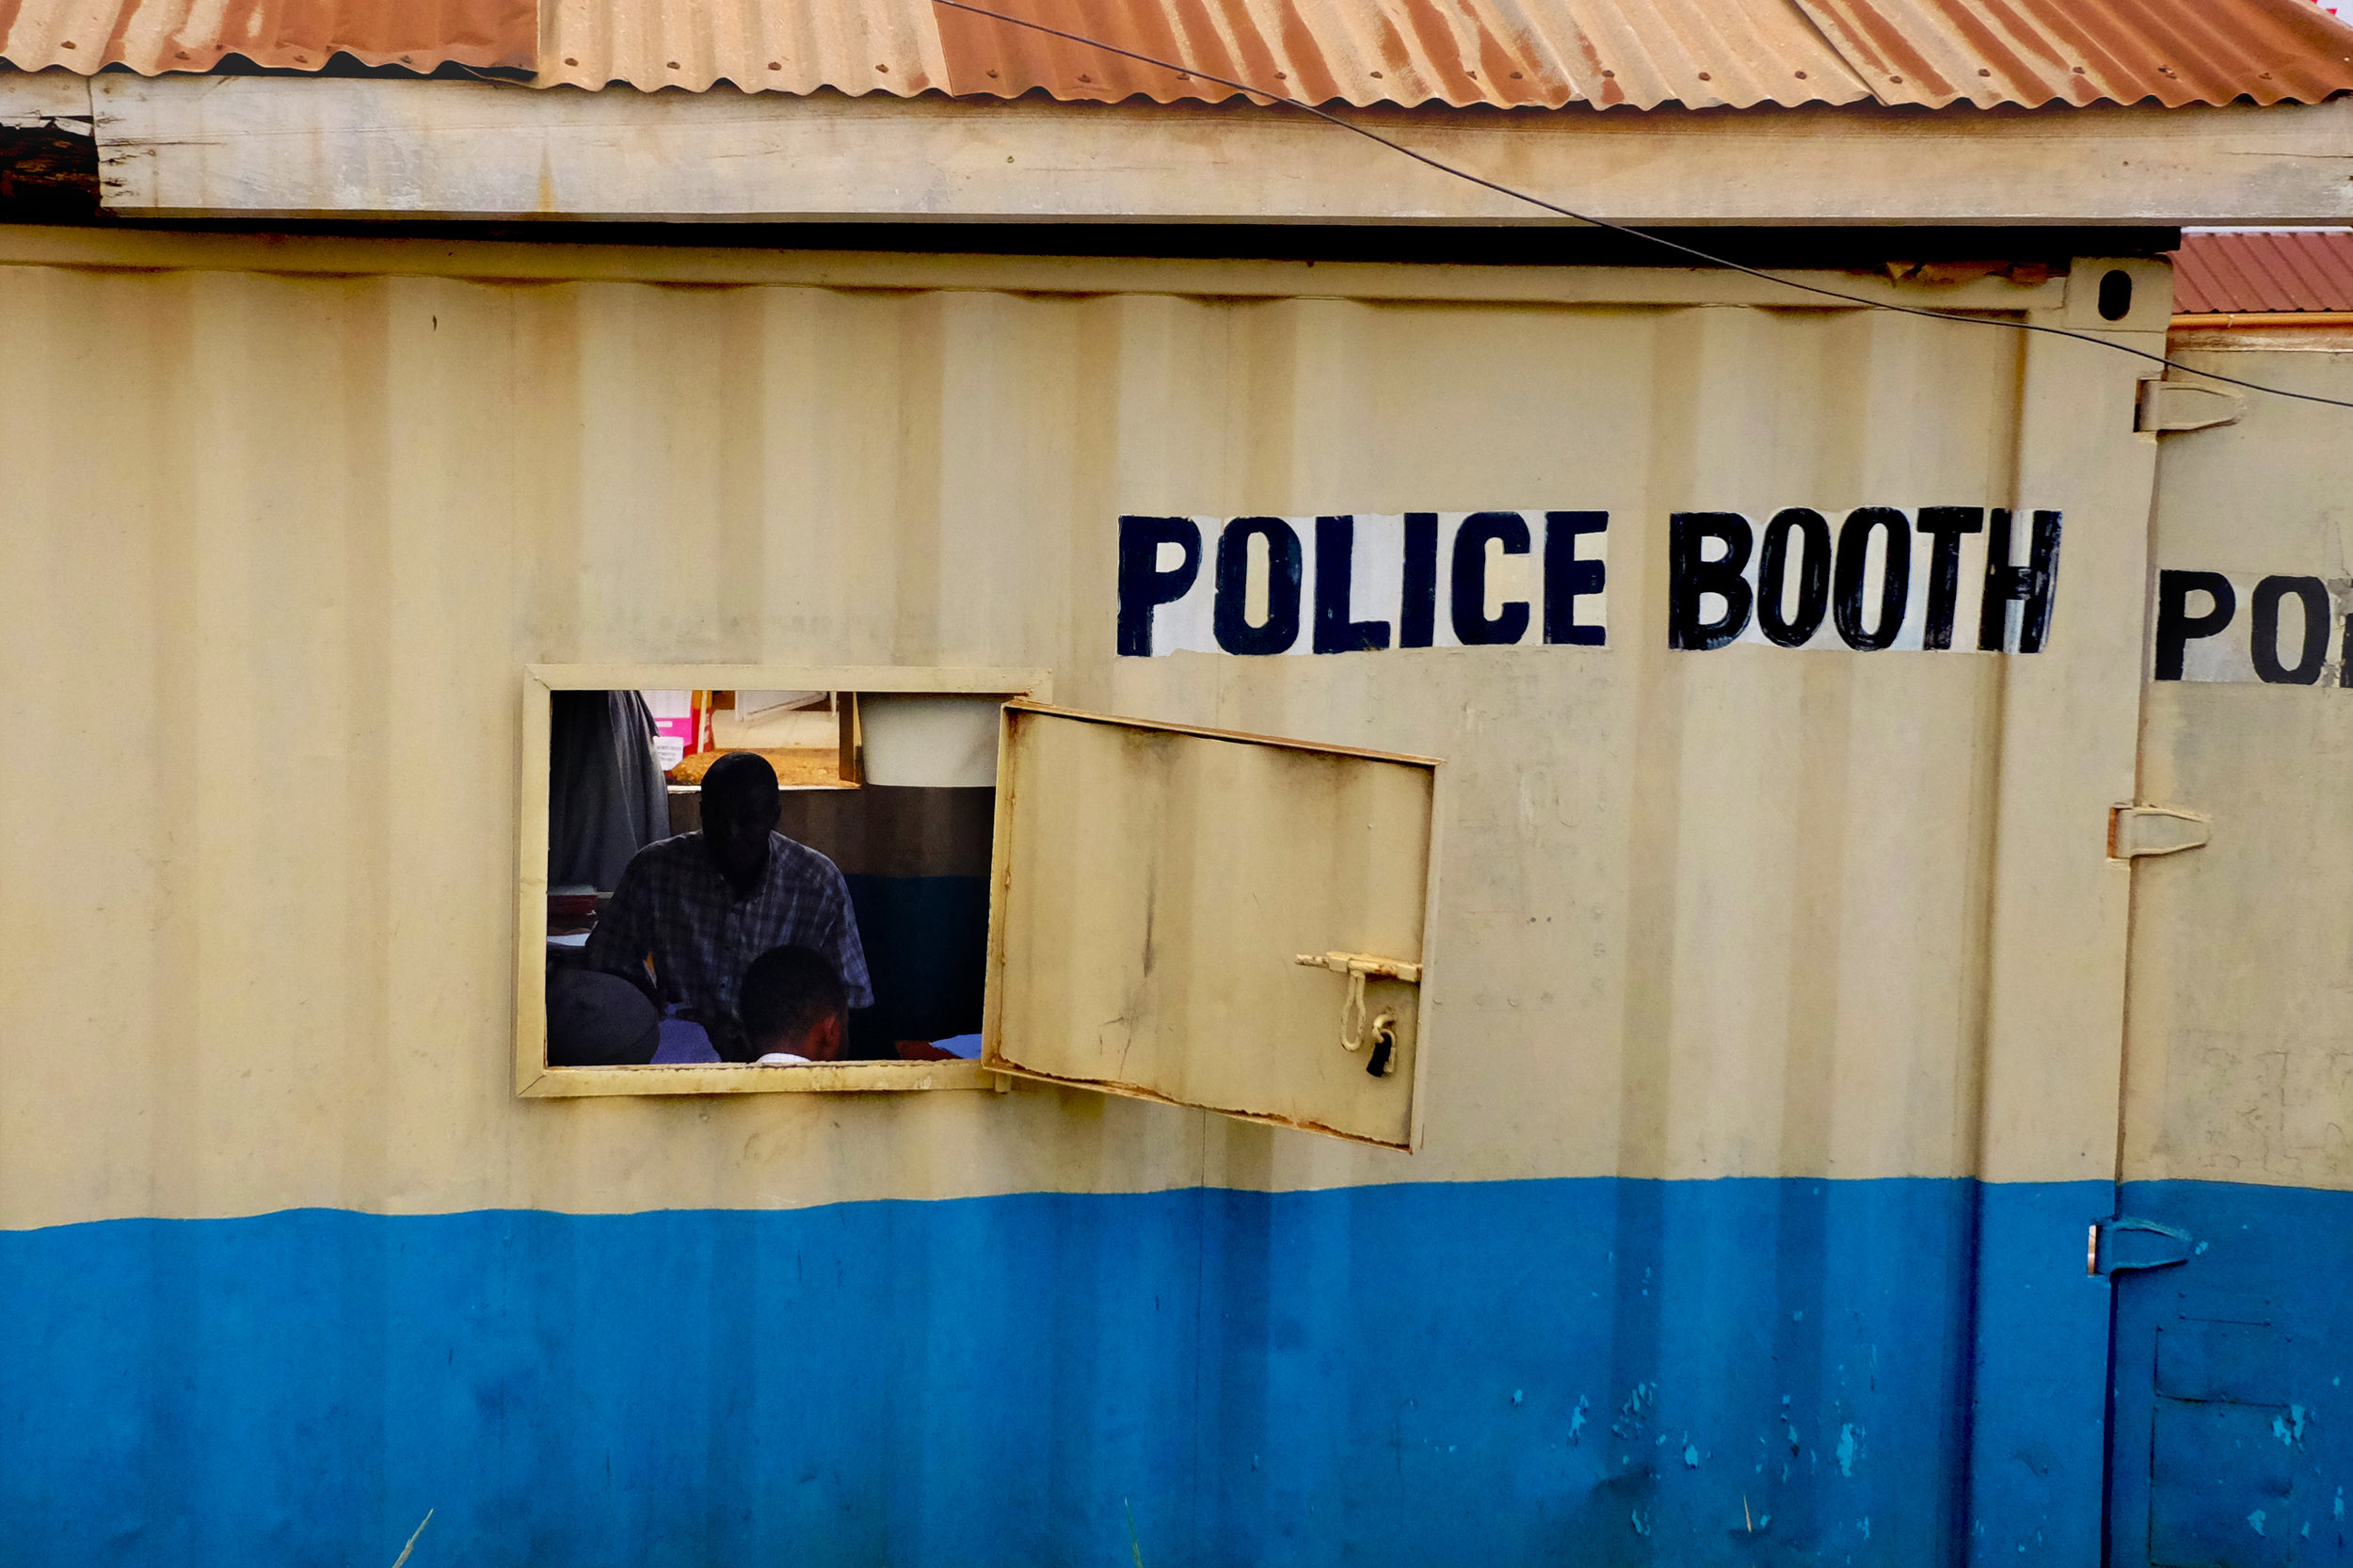 PoliceBoothUG.jpg